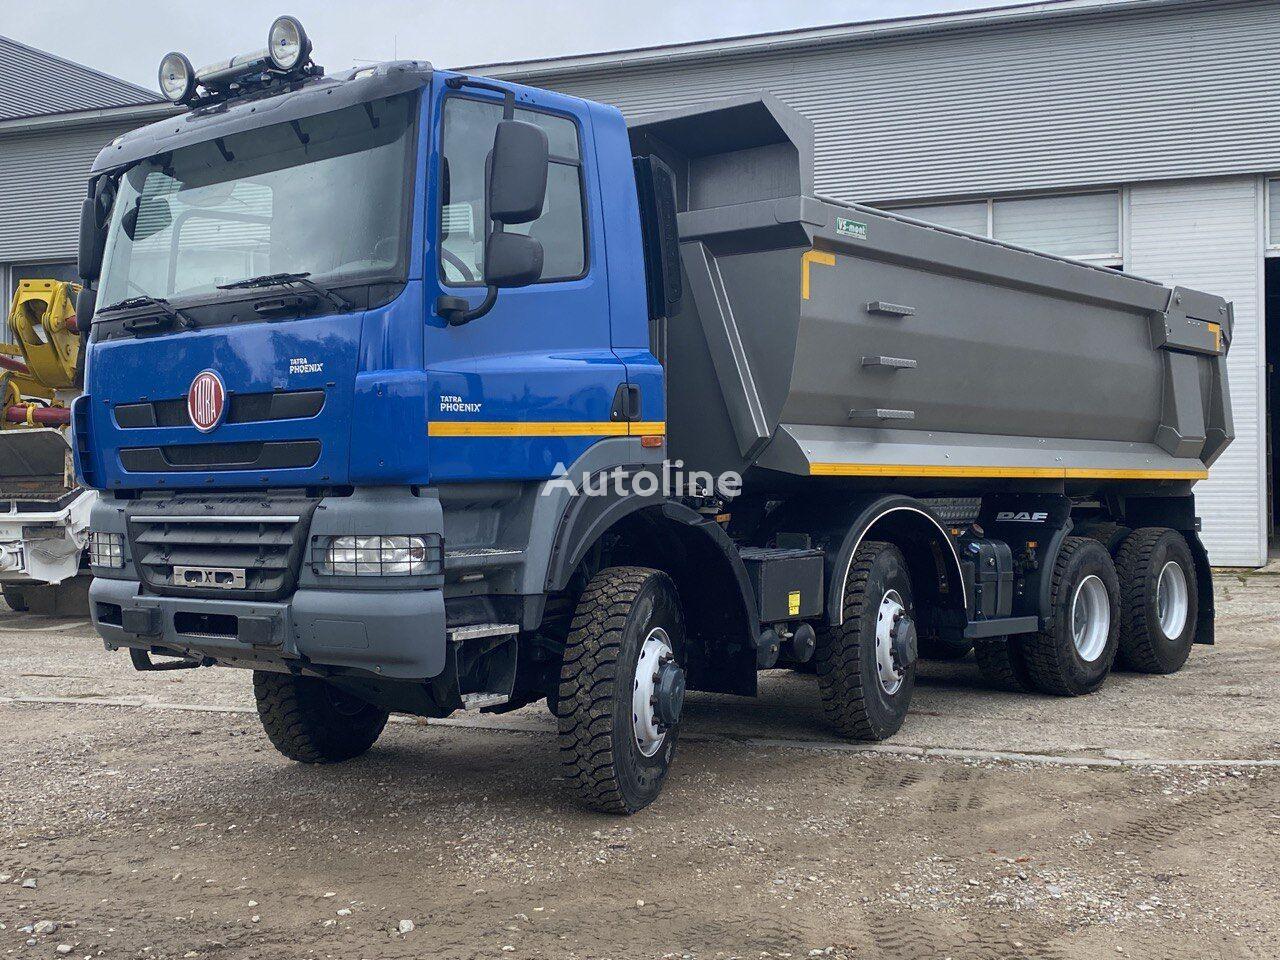 TATRA Phoenix 5400 8x8 billenős teherautó